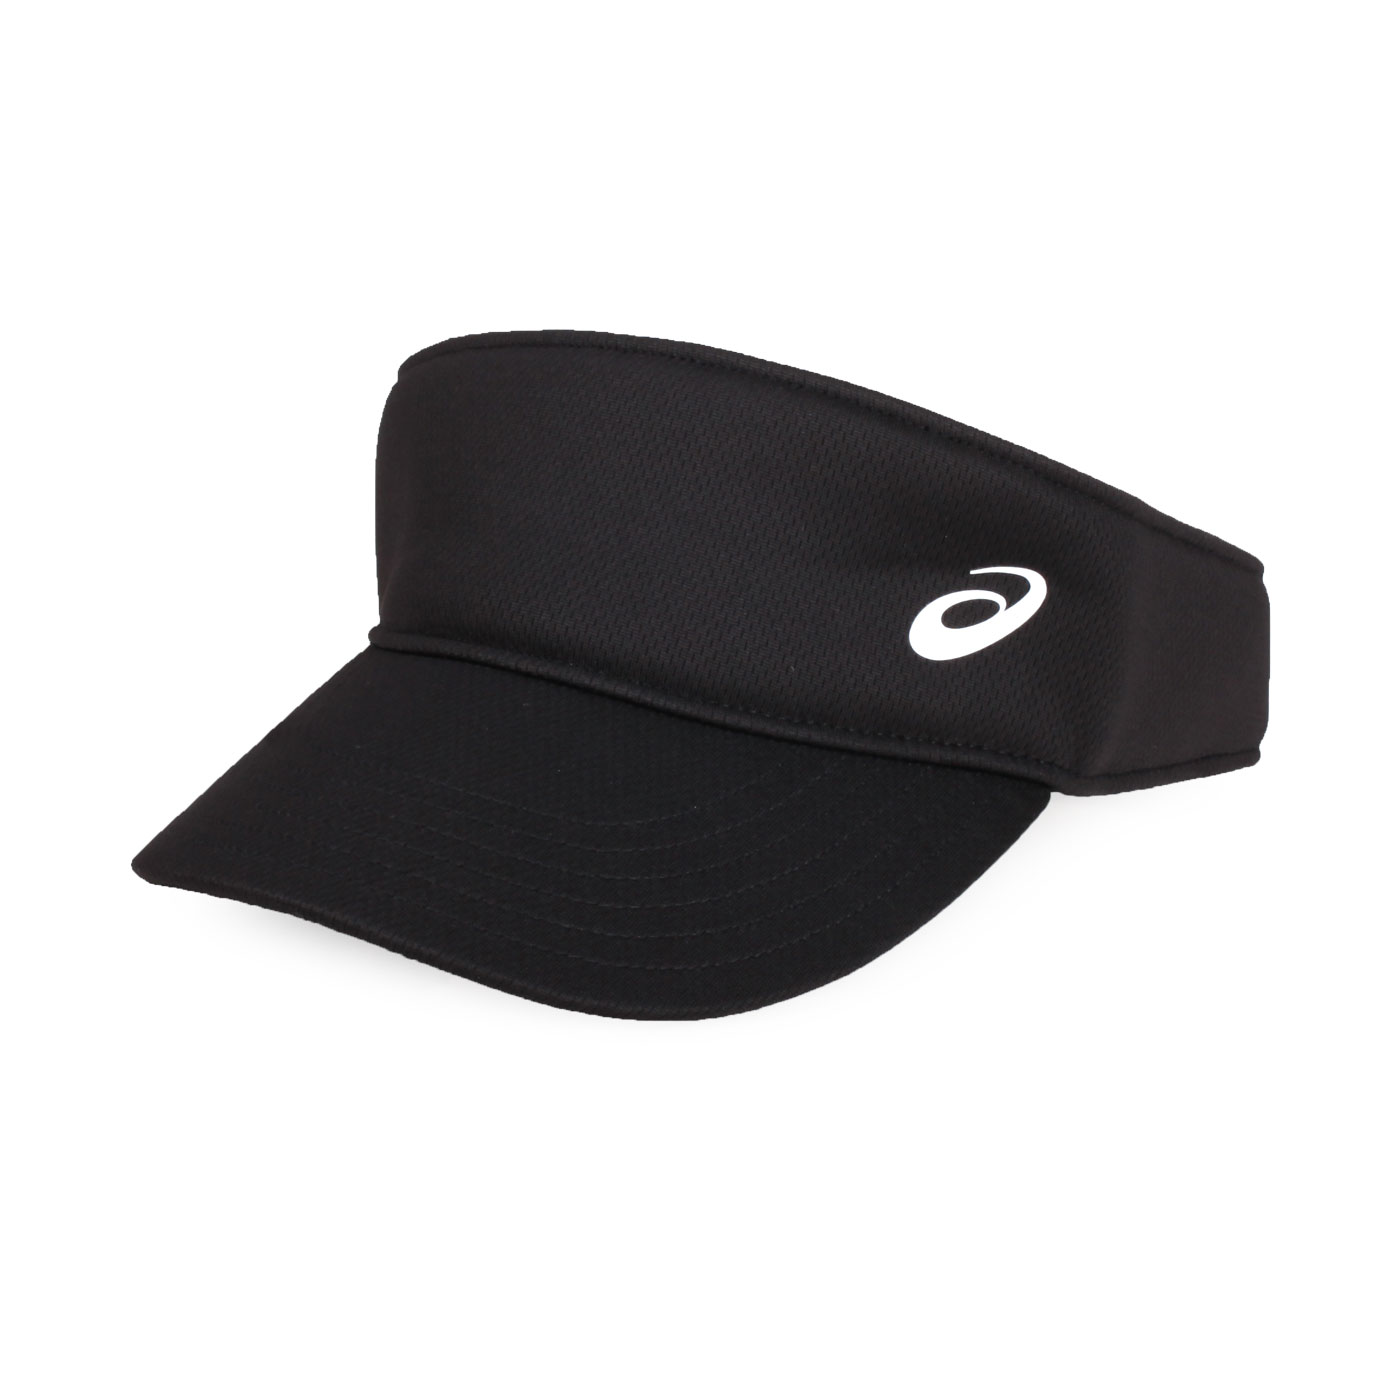 ASICS 運動遮陽帽 155941-001 - 黑白